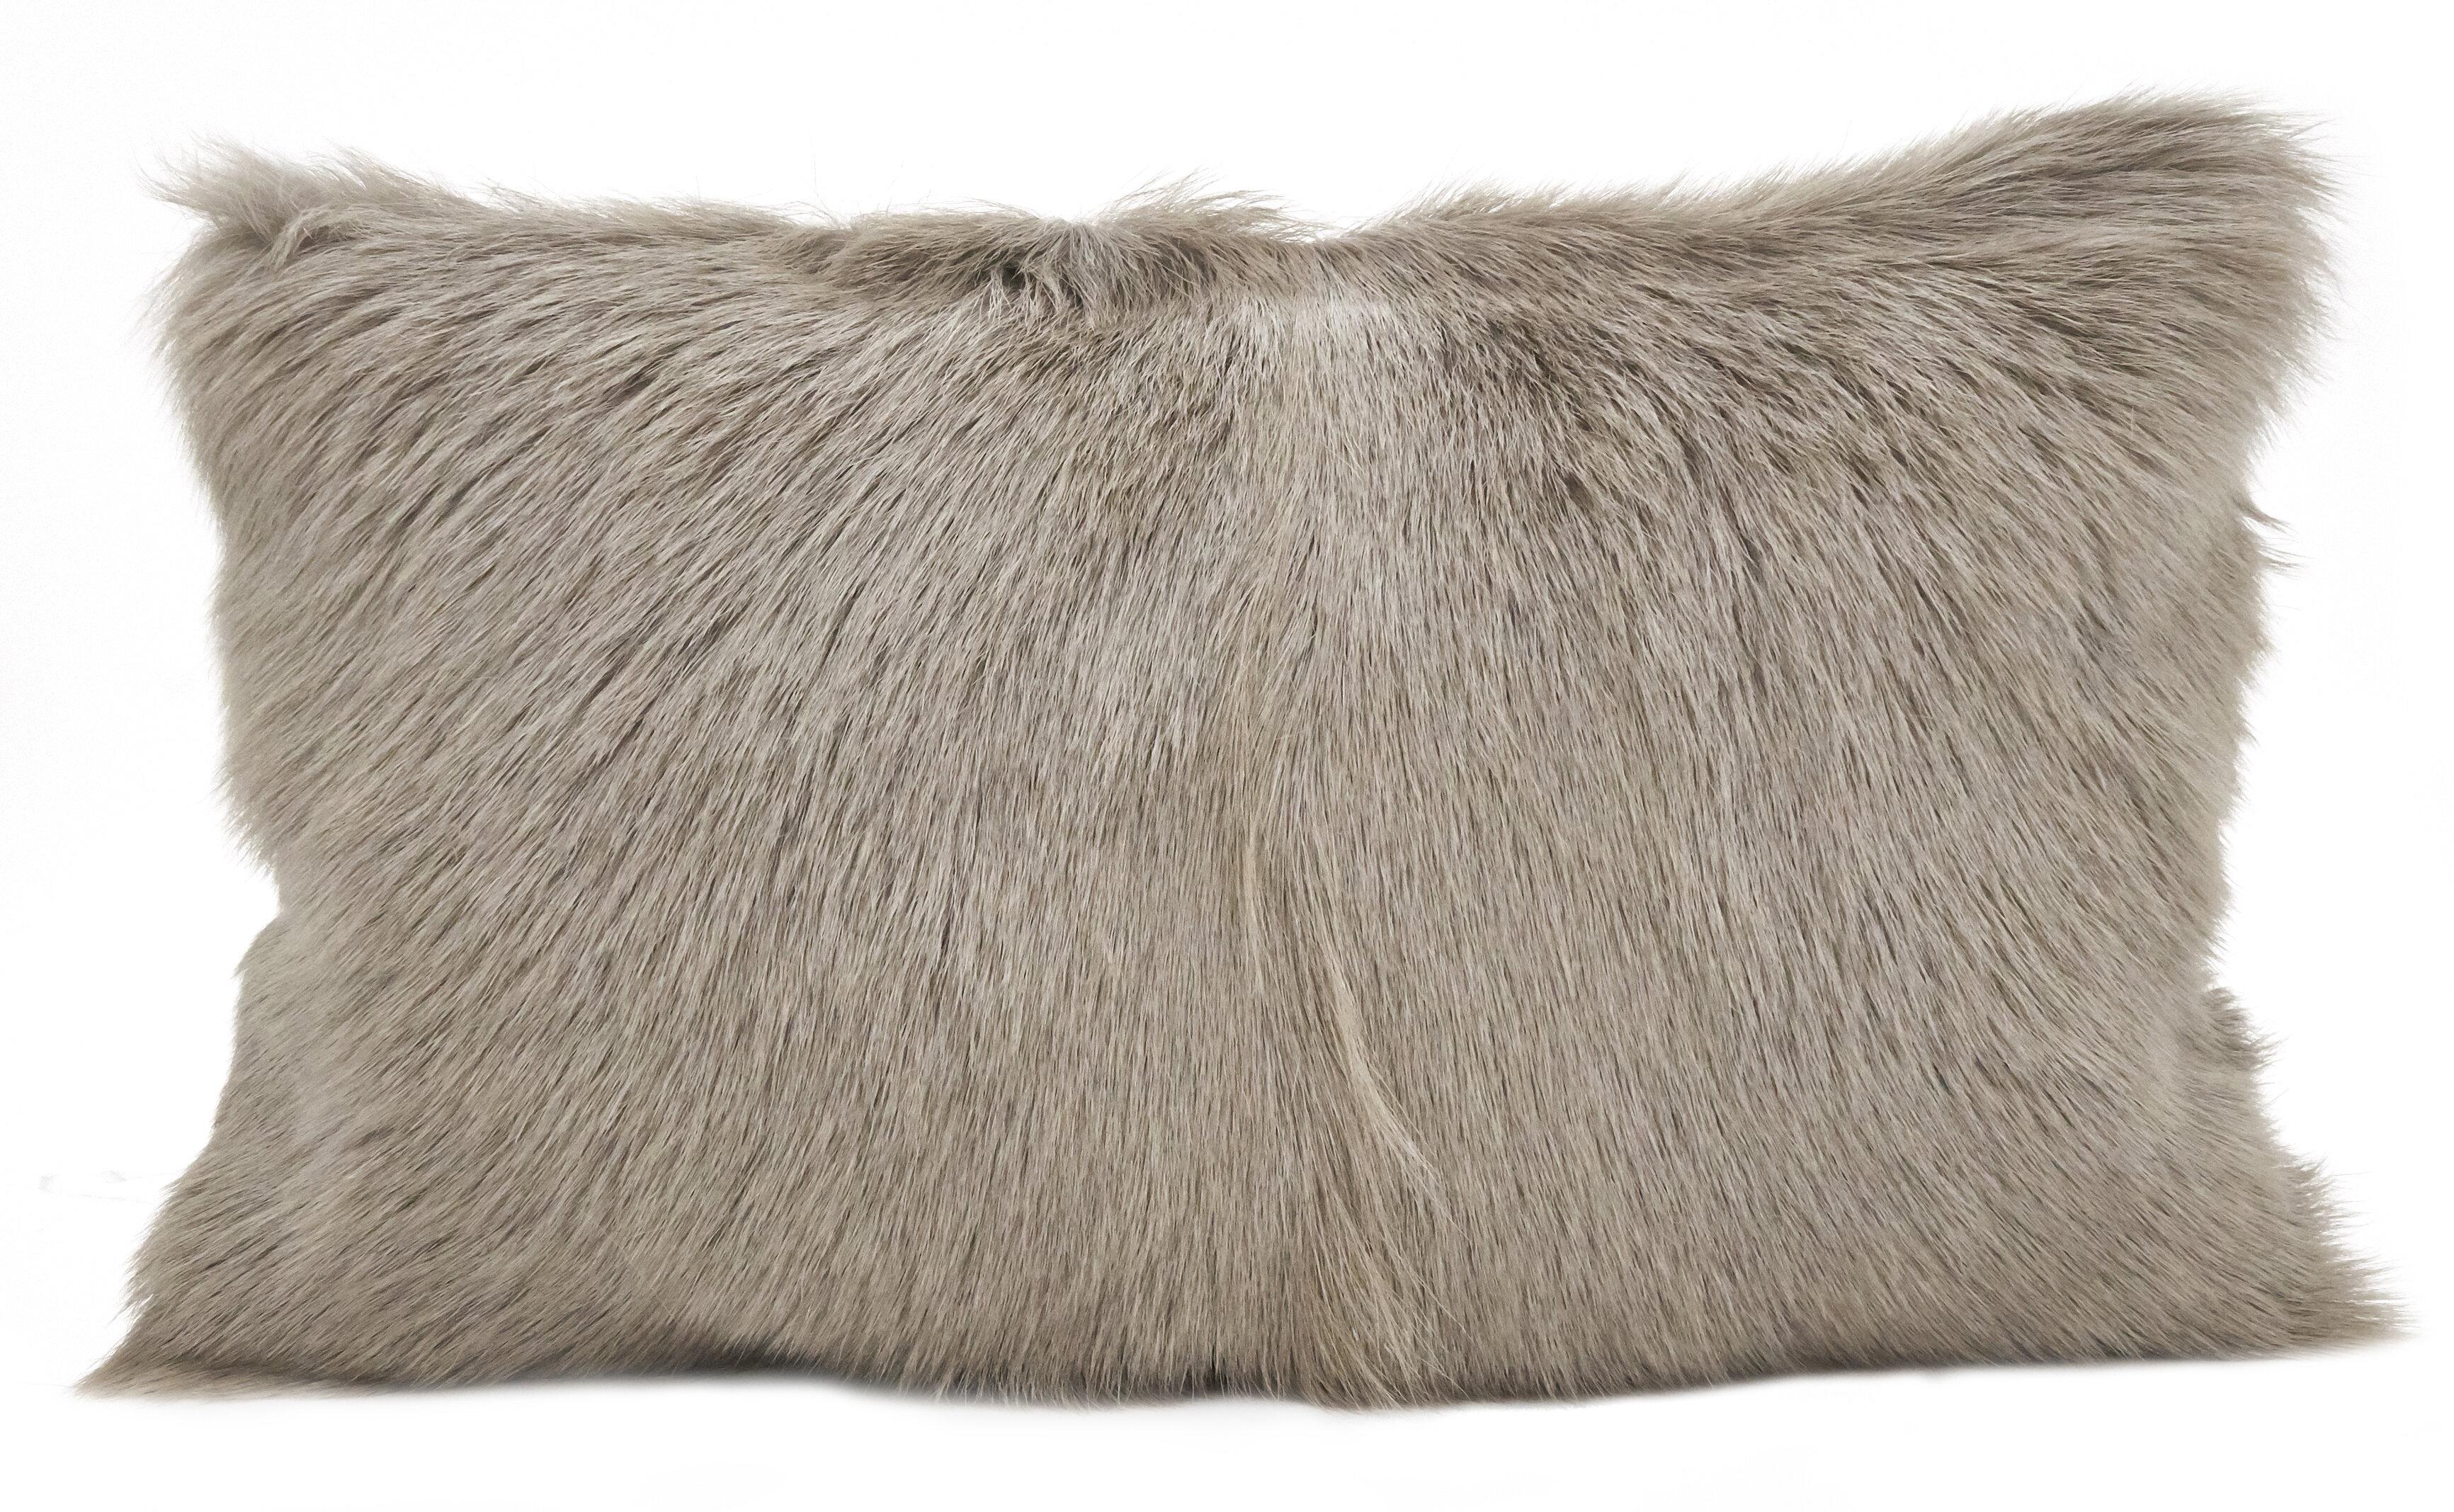 Union Rustic Oquinn Goat Fur Lumbar Pillow Reviews Wayfair